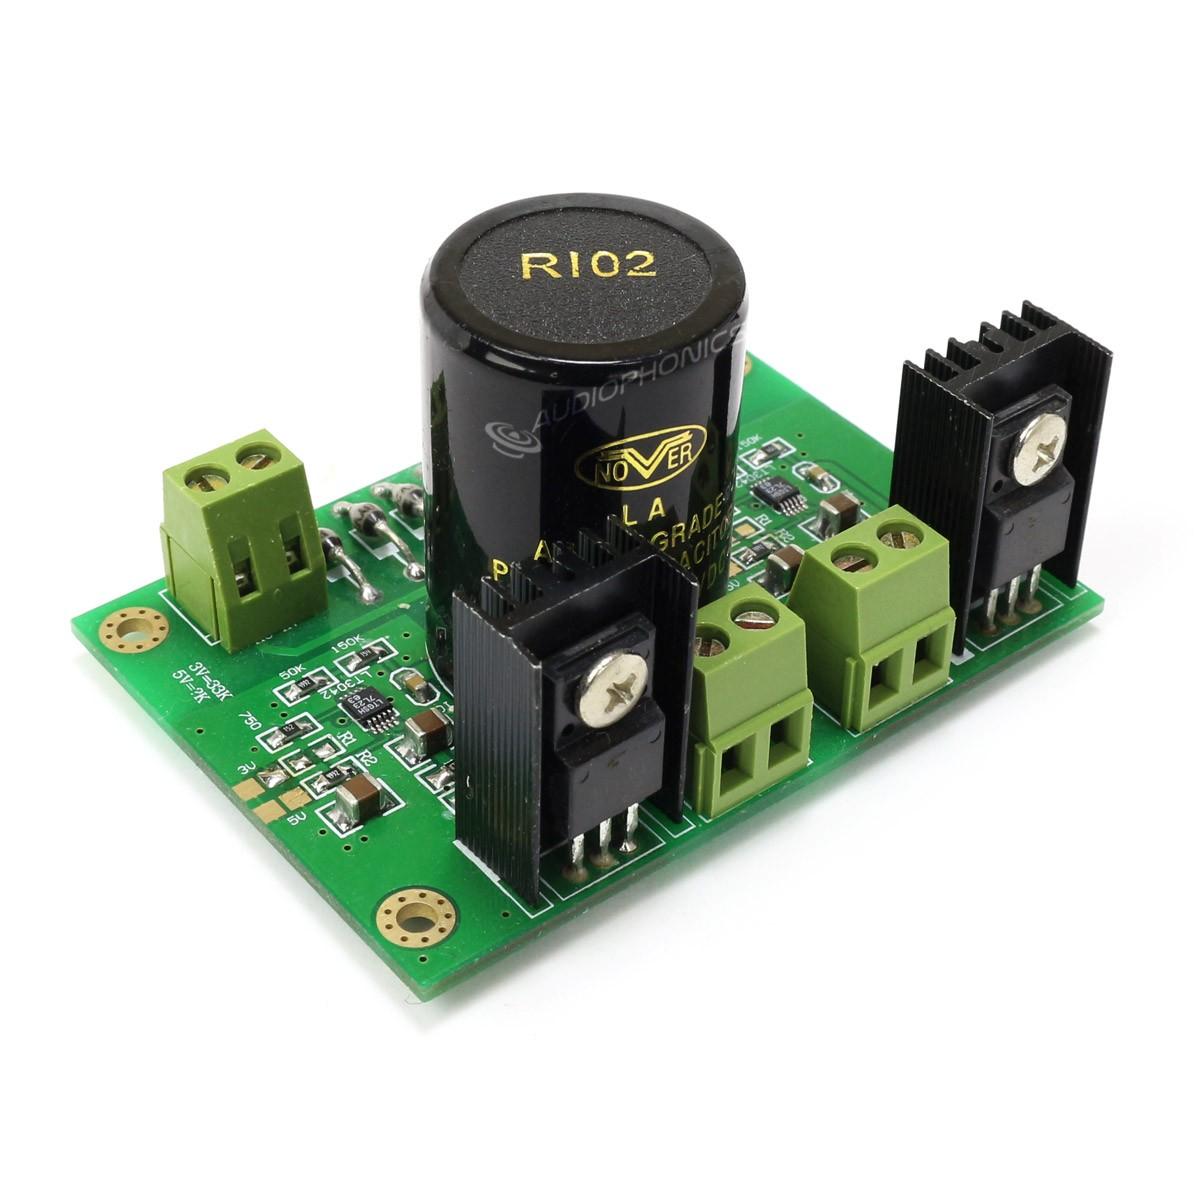 Dual Linear Power Supply Module LT3042 5V / 3.3V 1A